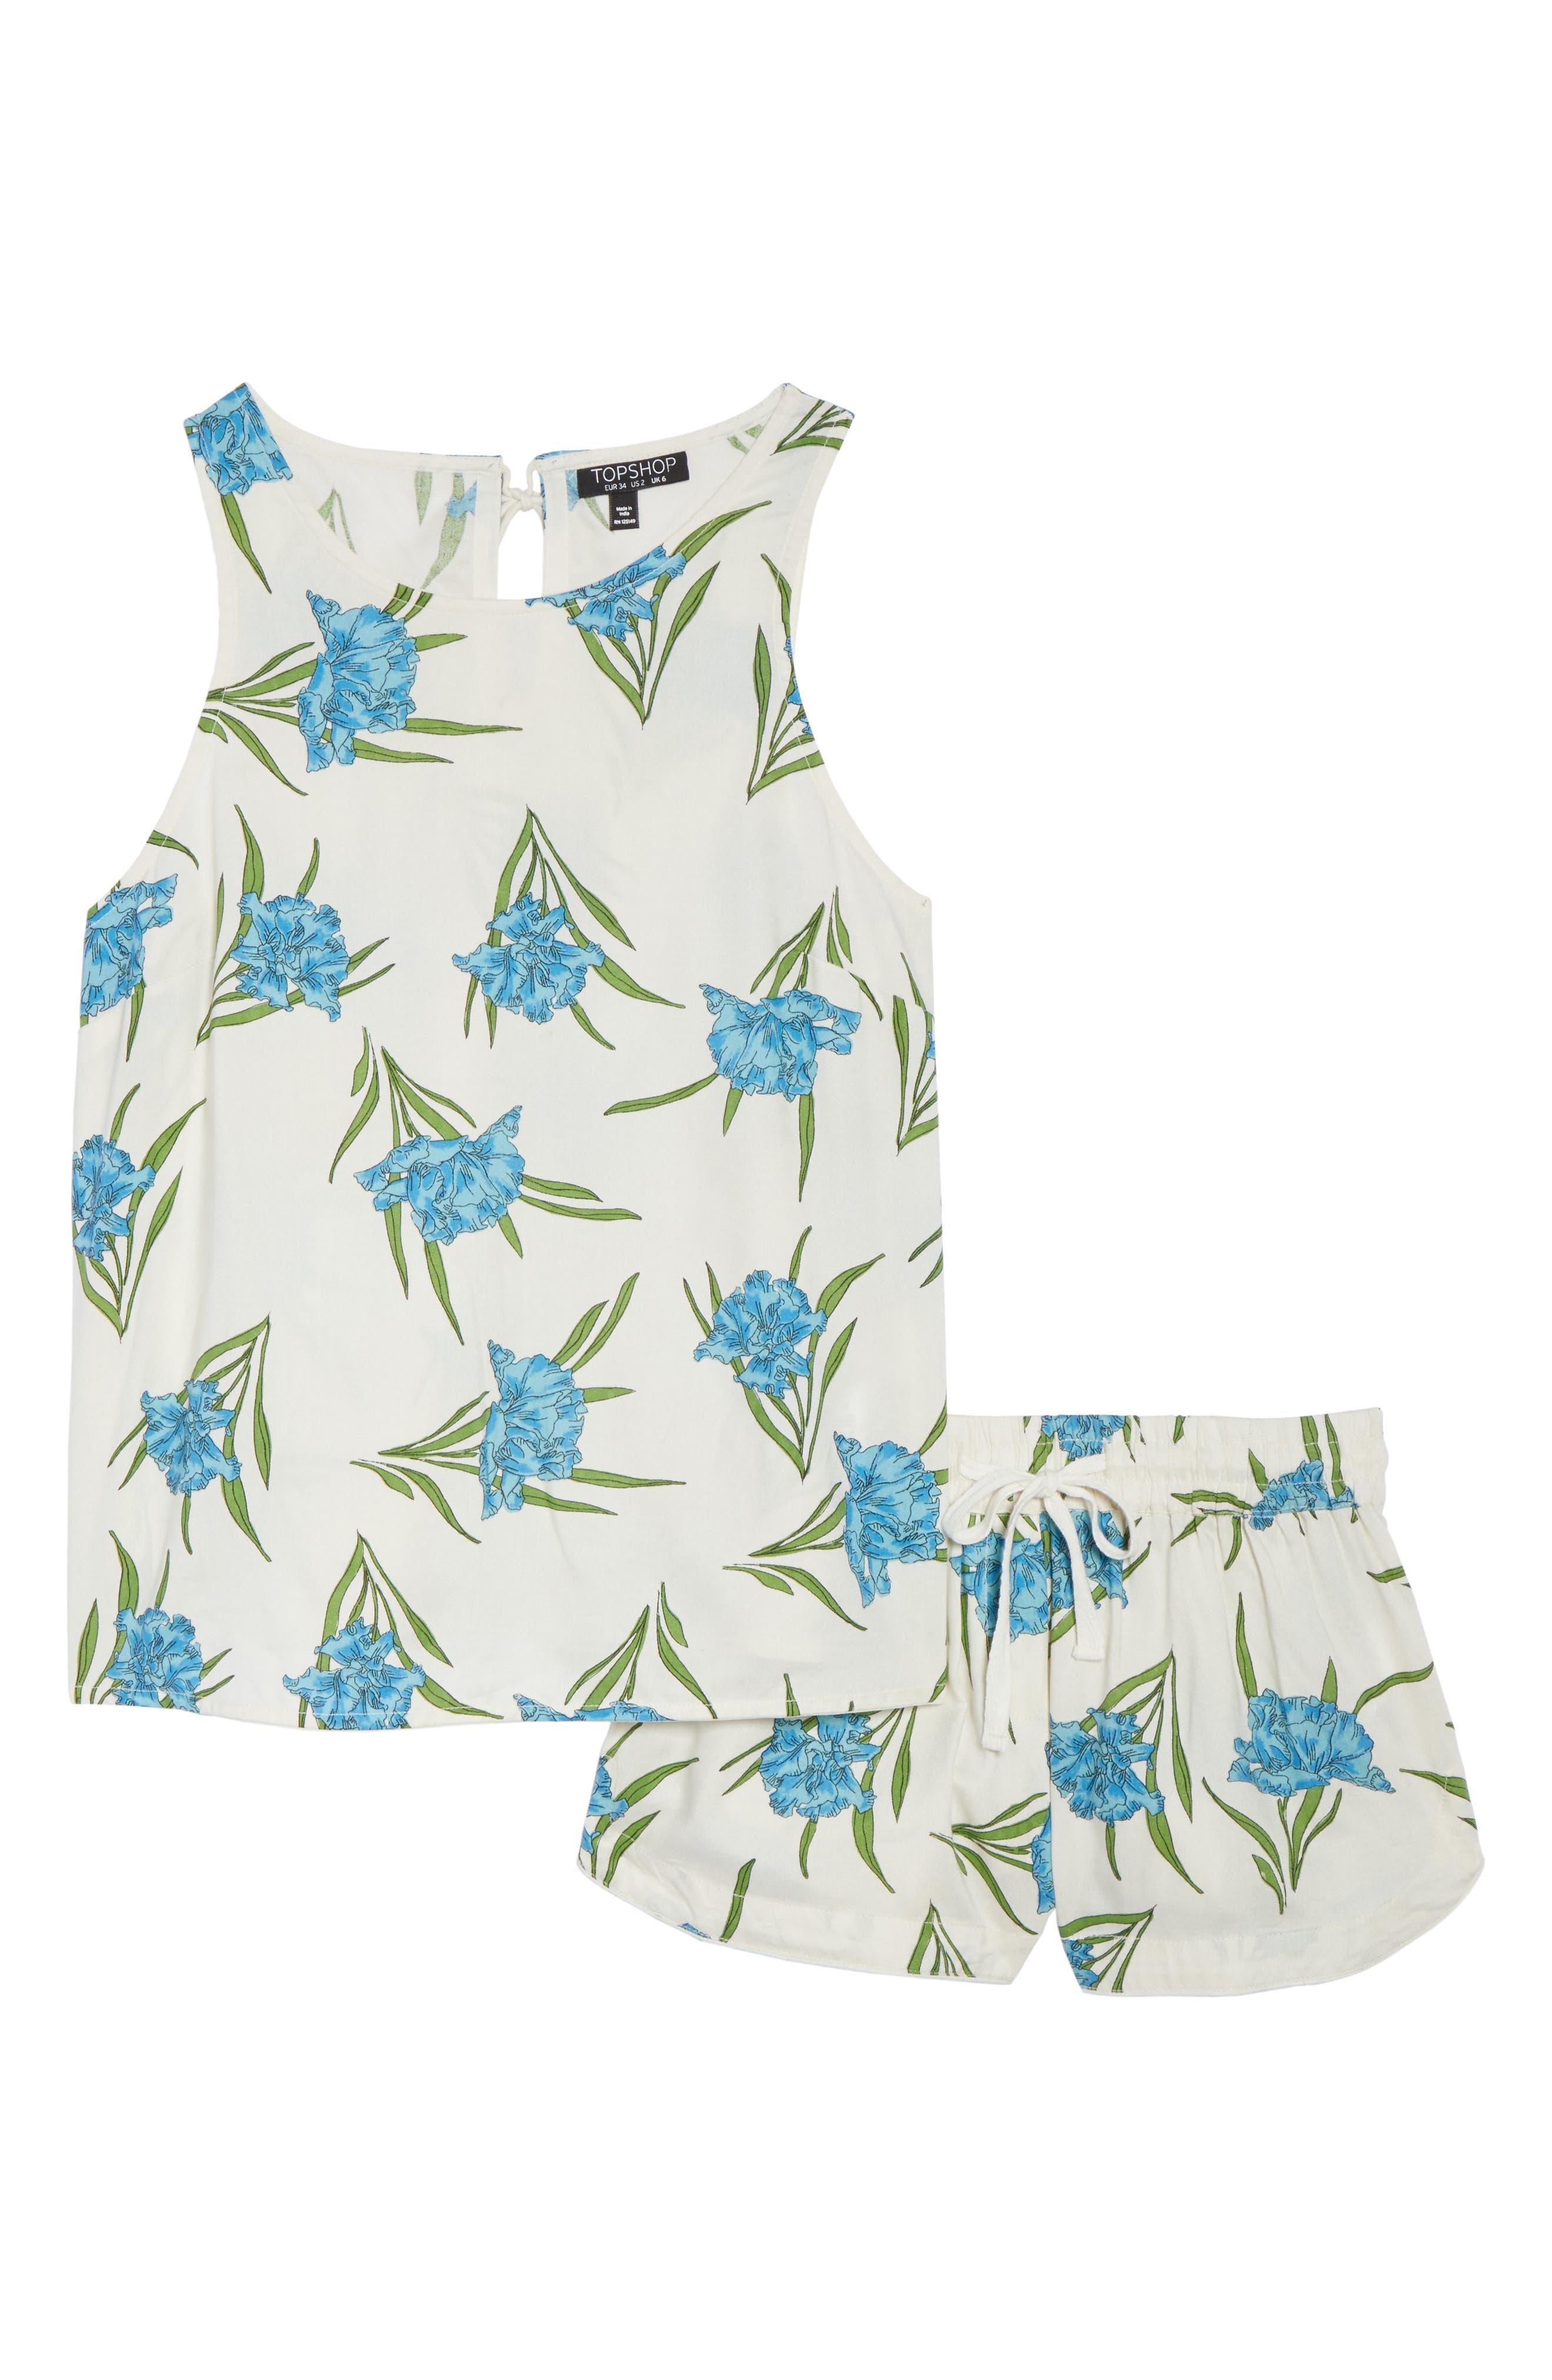 Botanical Short Pajamas,                             Alternate thumbnail 4, color,                             Ivory Multi